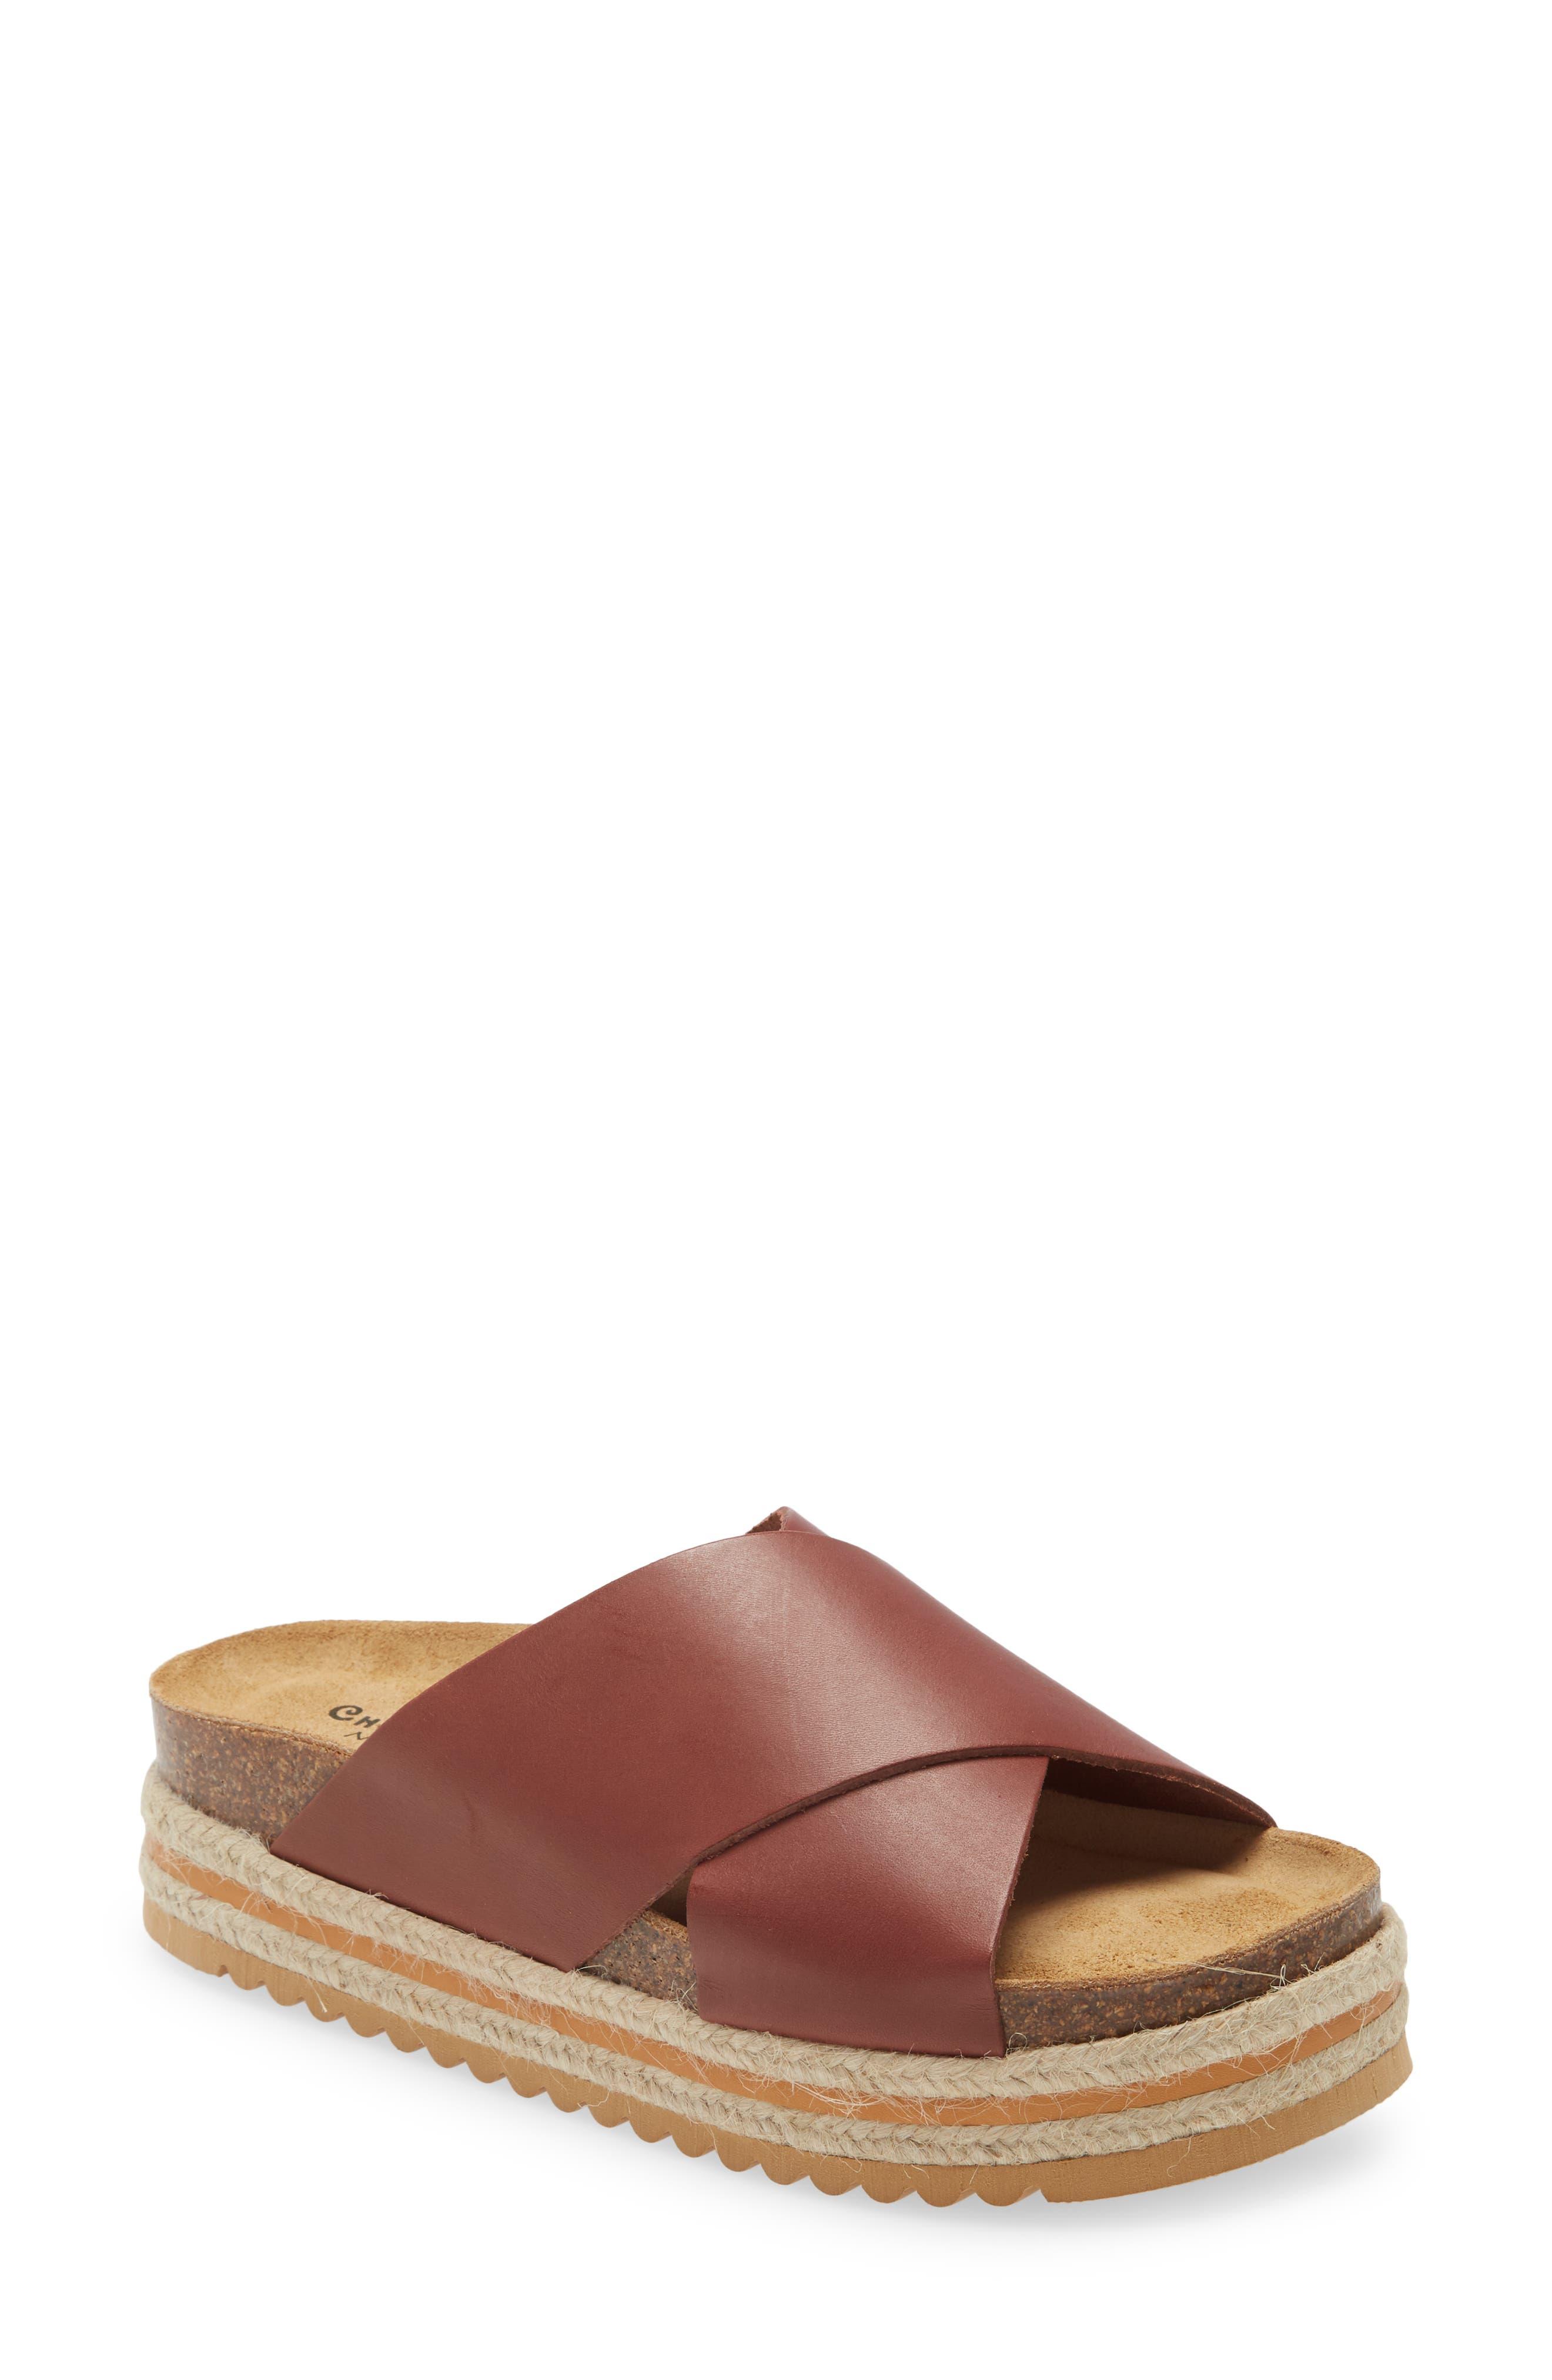 e Lina Platform Slide Sandal